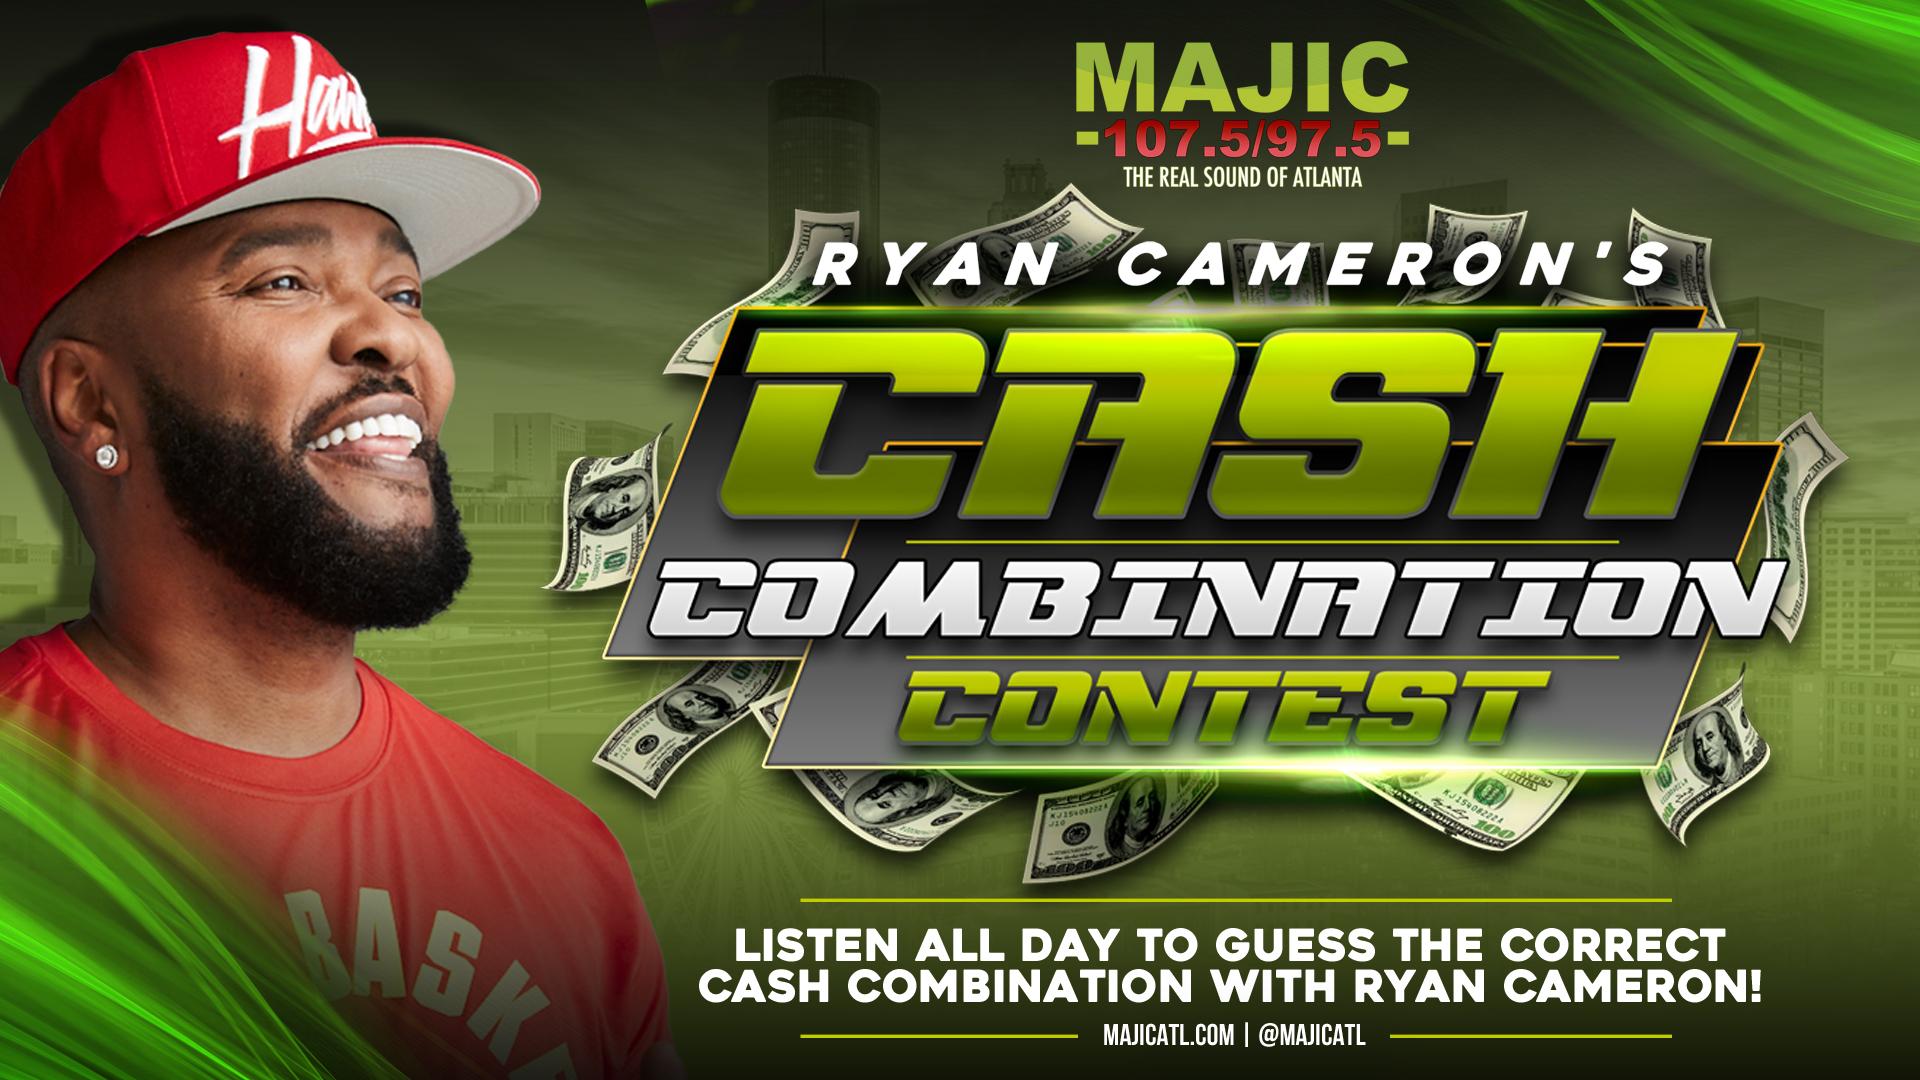 Ryan Cameron Cash Contest